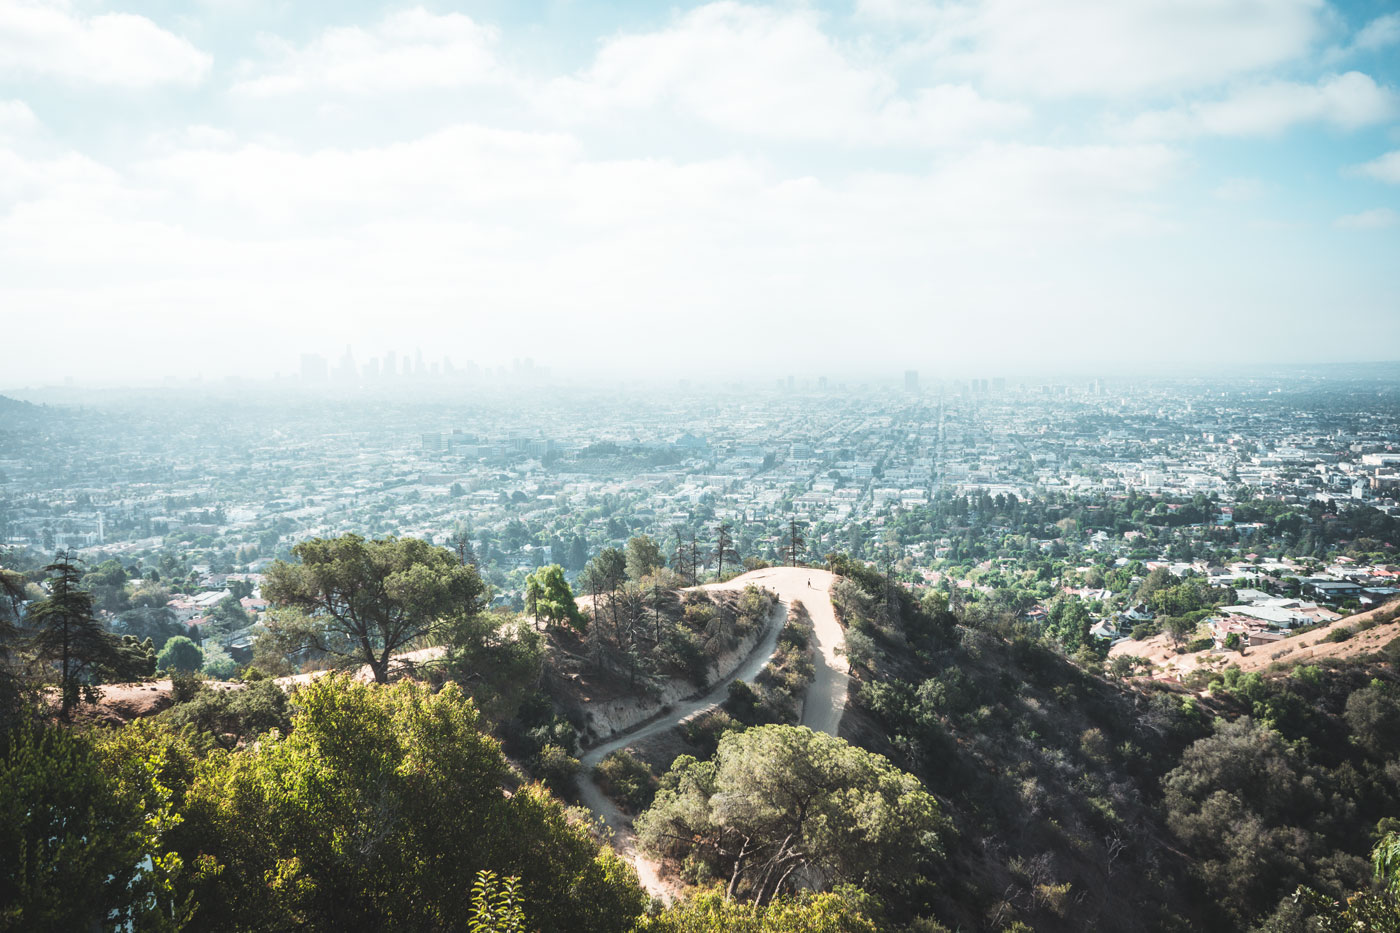 Los Angeles 2018